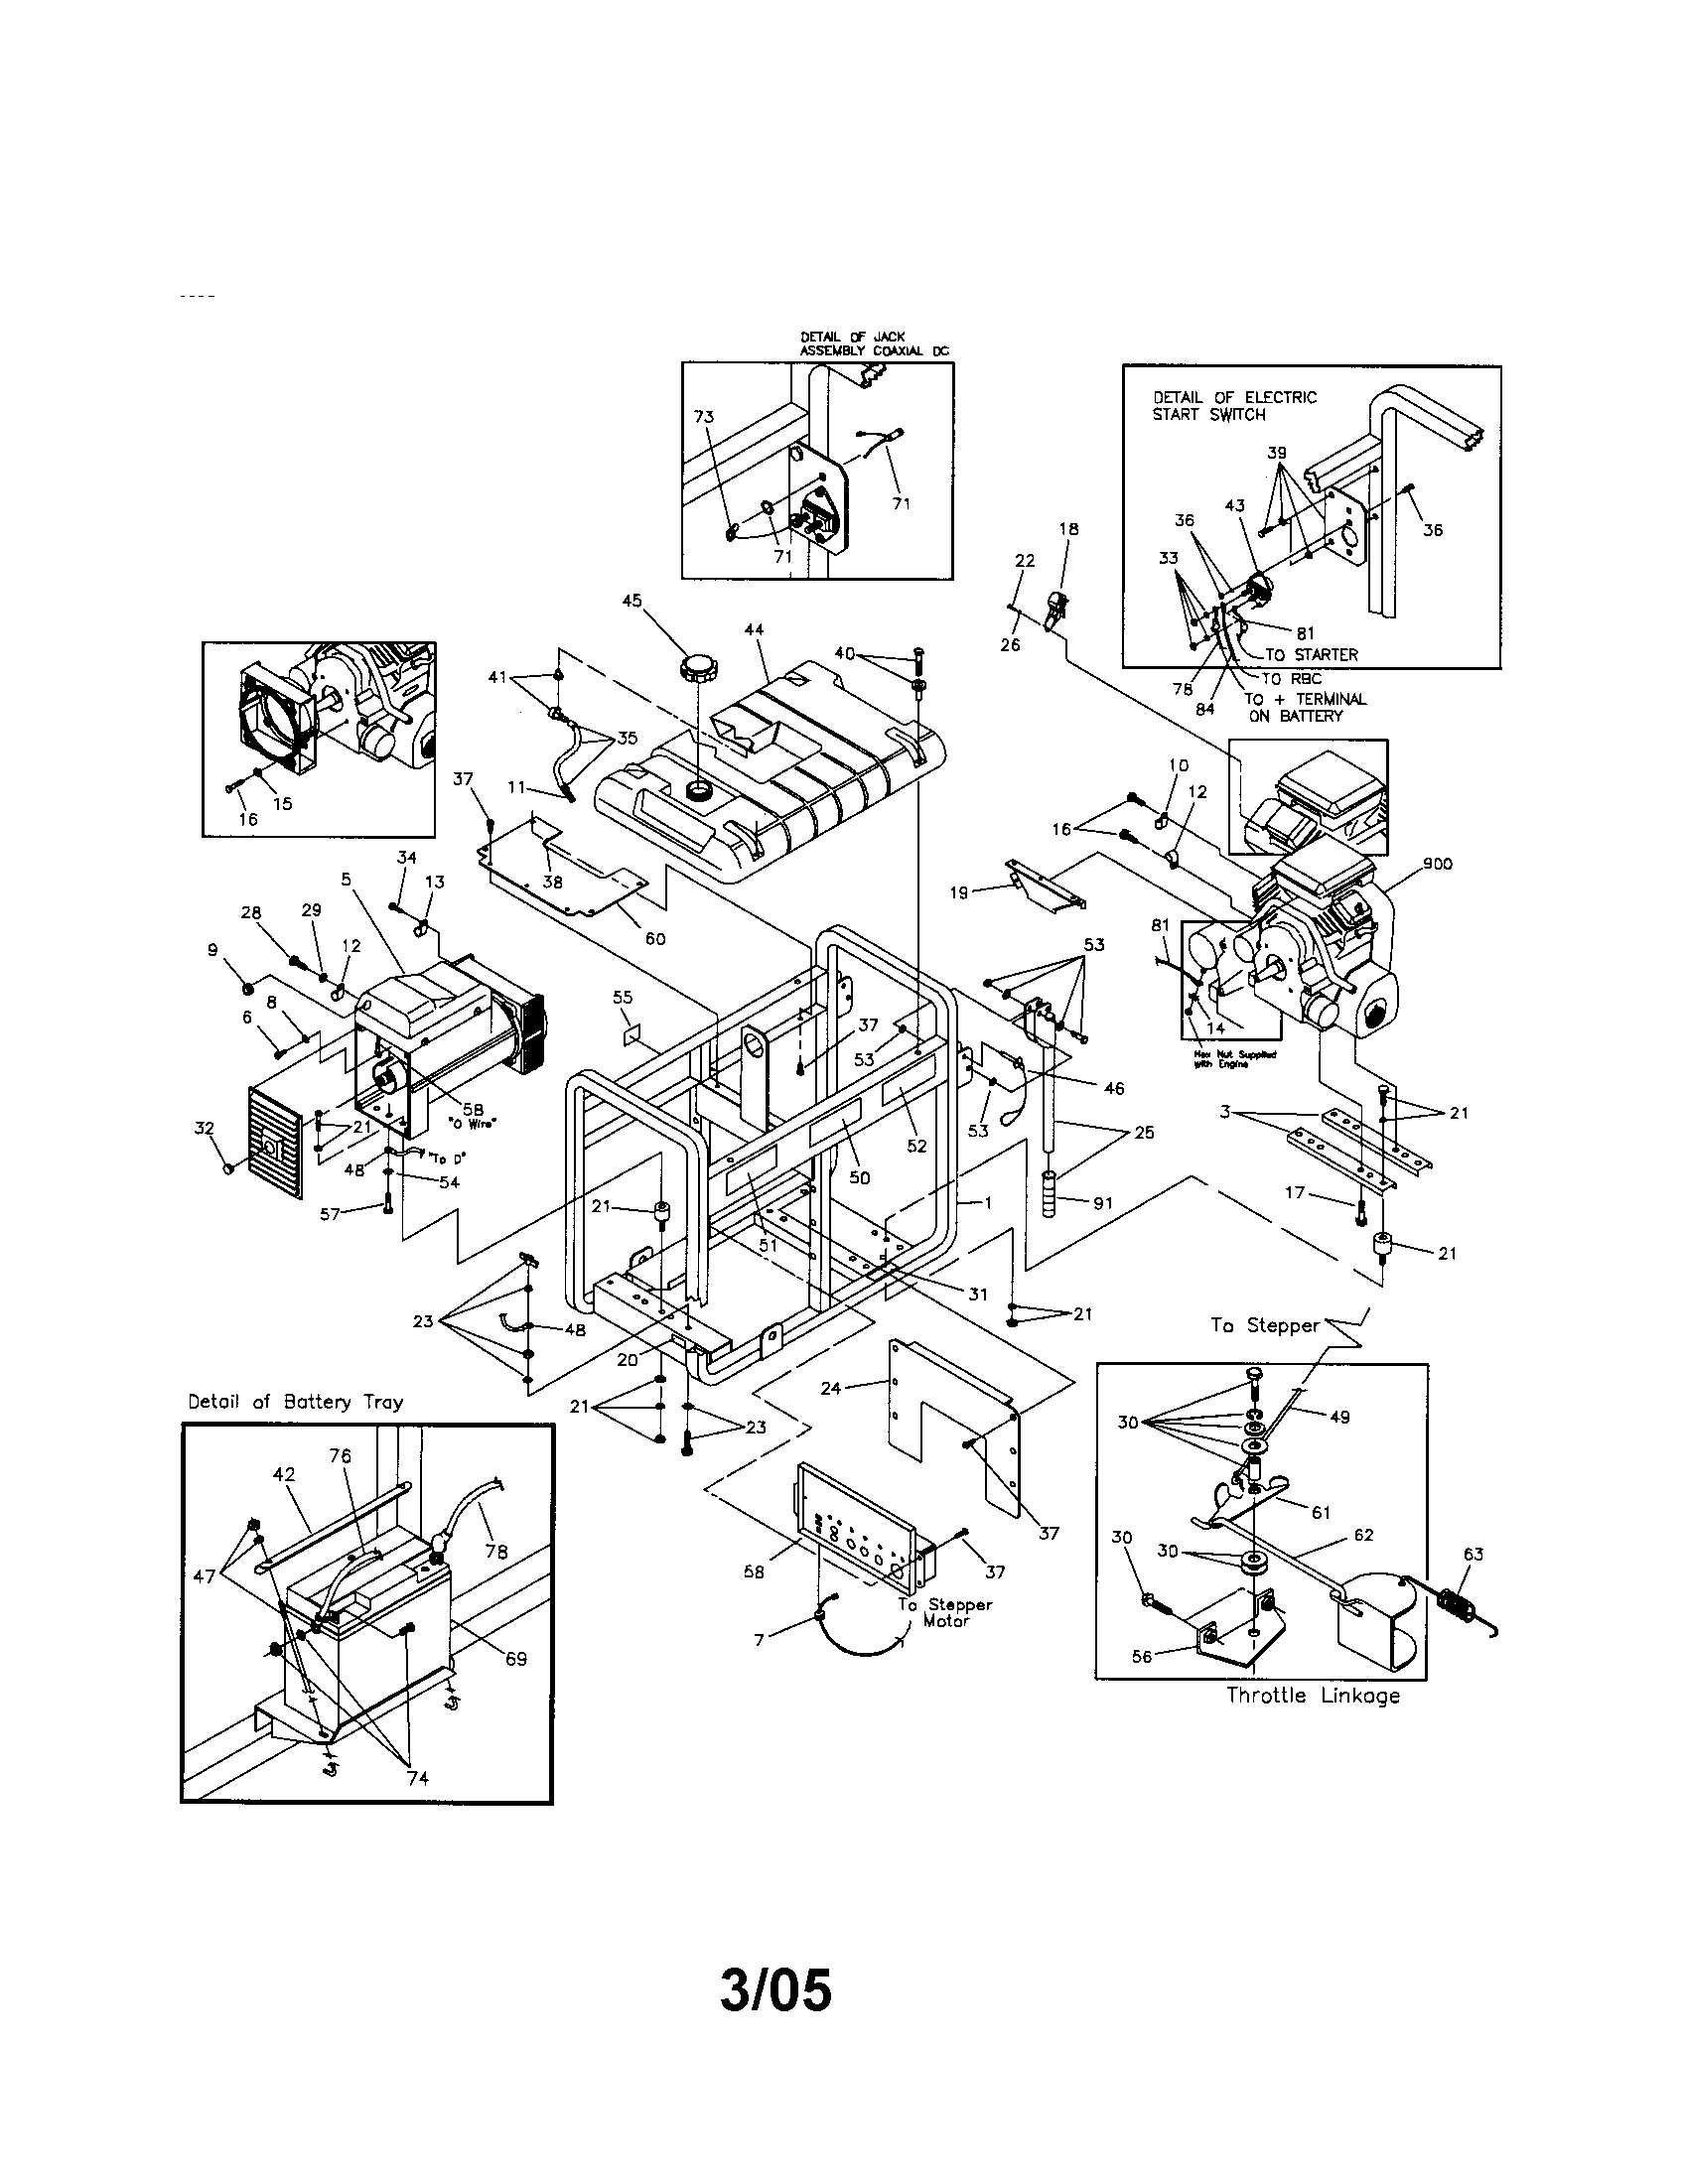 onan transfer switch diagram honda super cub 50 wiring pulse fuel pump diagrams schemes